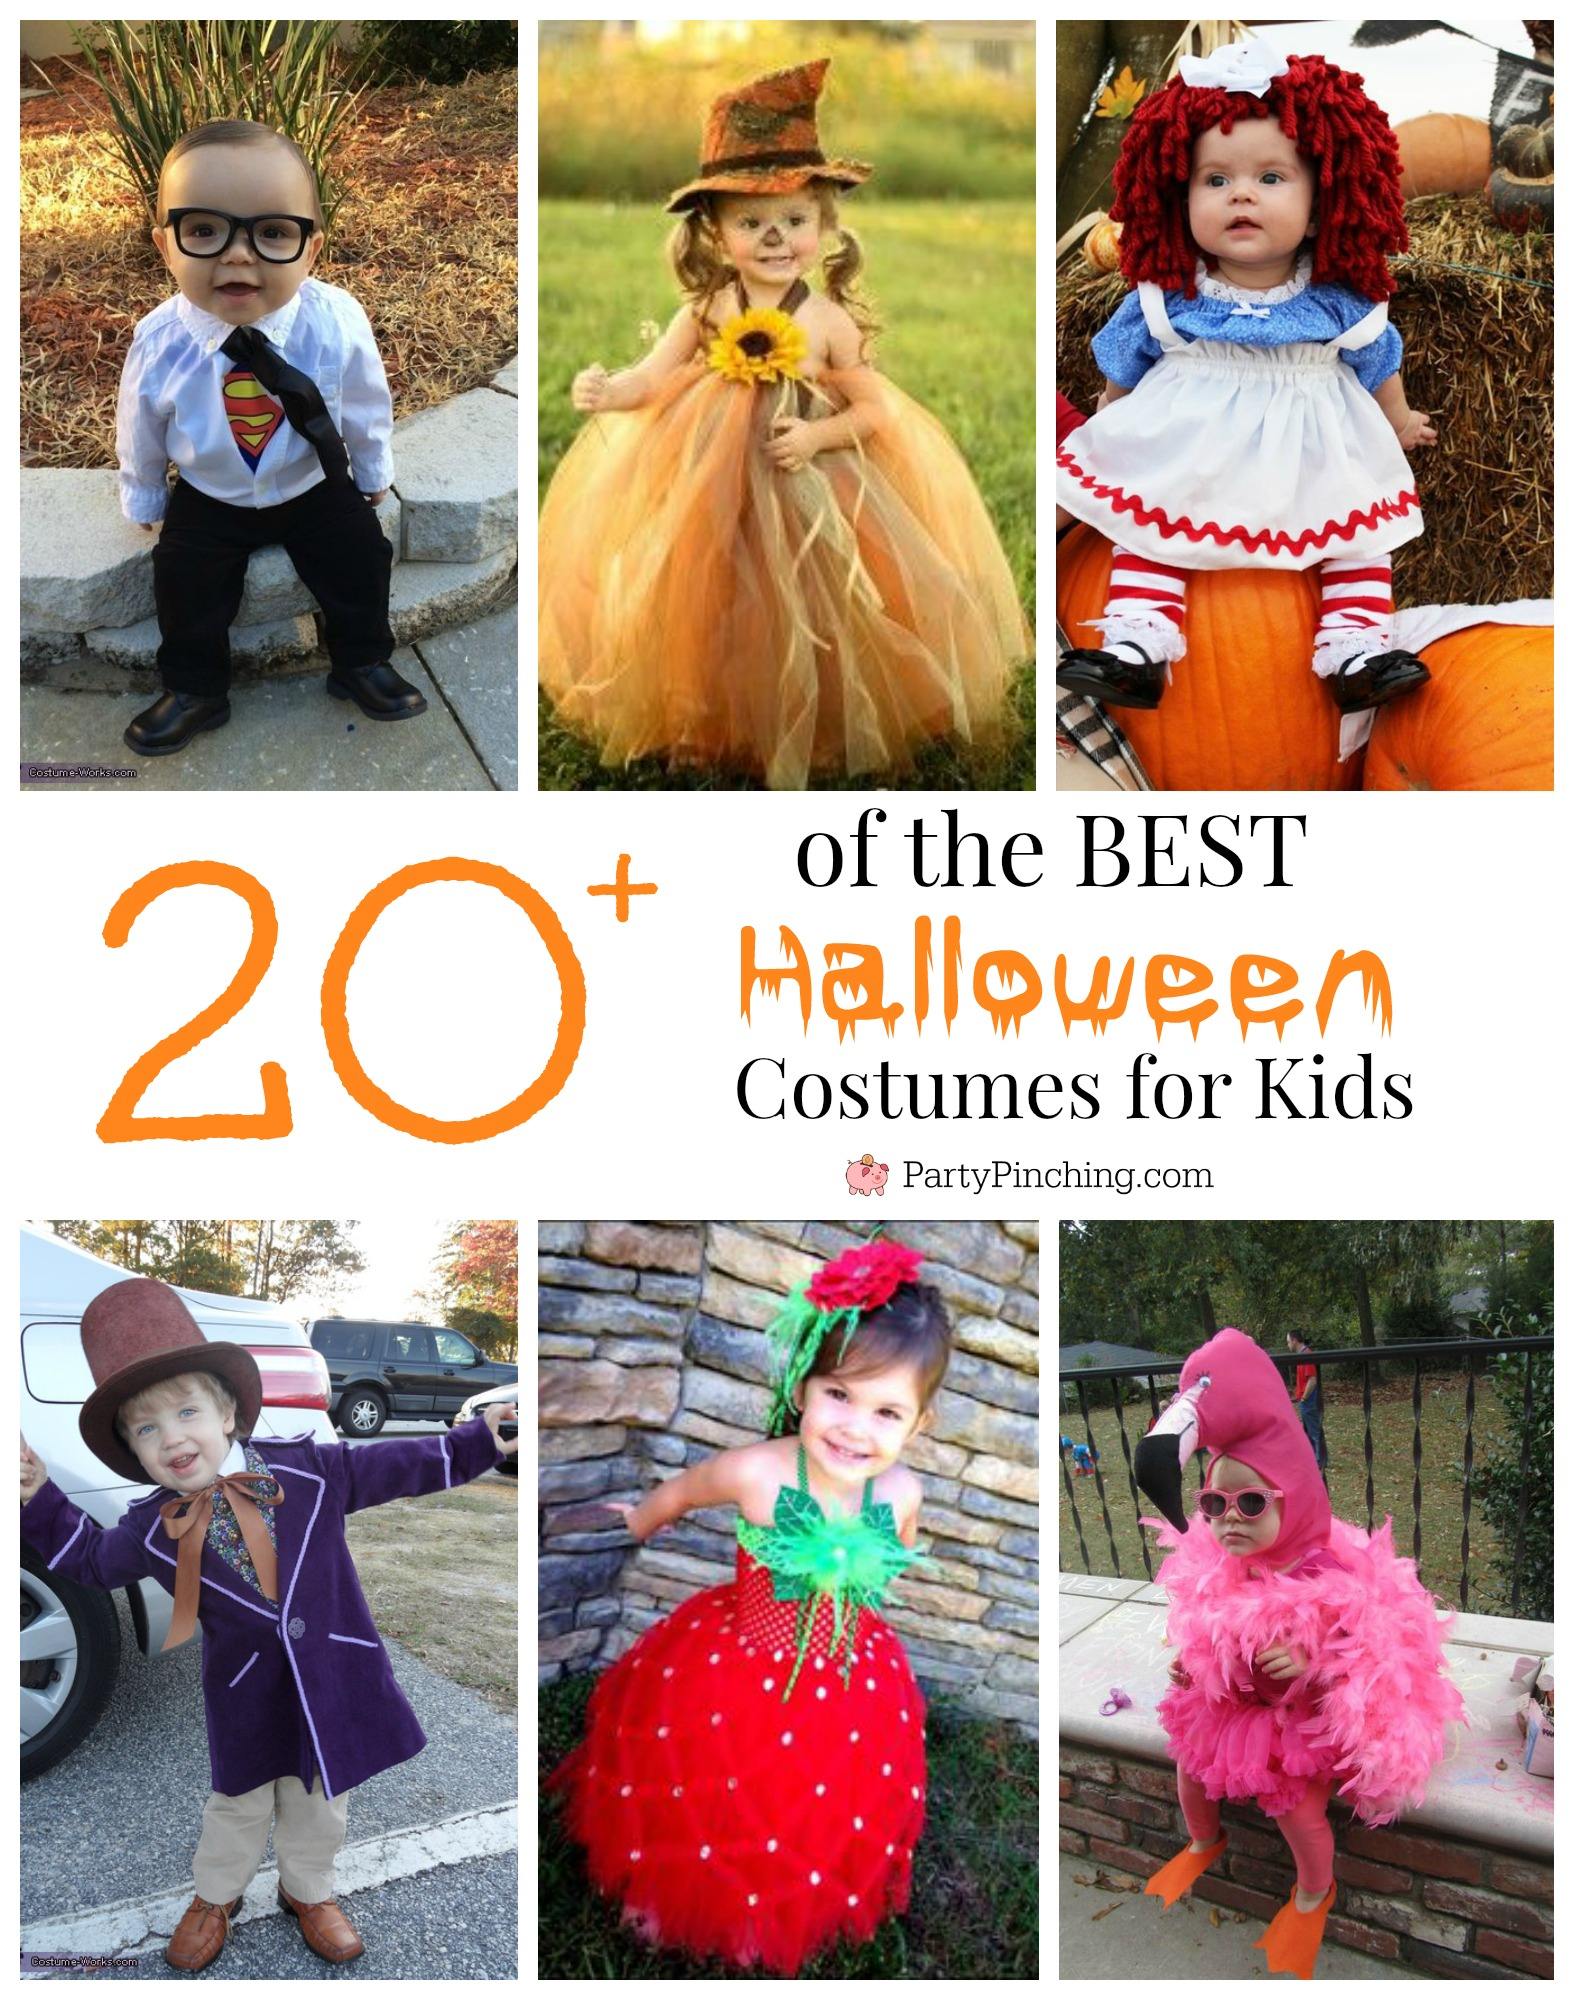 Halloween Ideas For 3 Boys.Best Halloween Costume Ideas Kids Toddlers Babies Infants